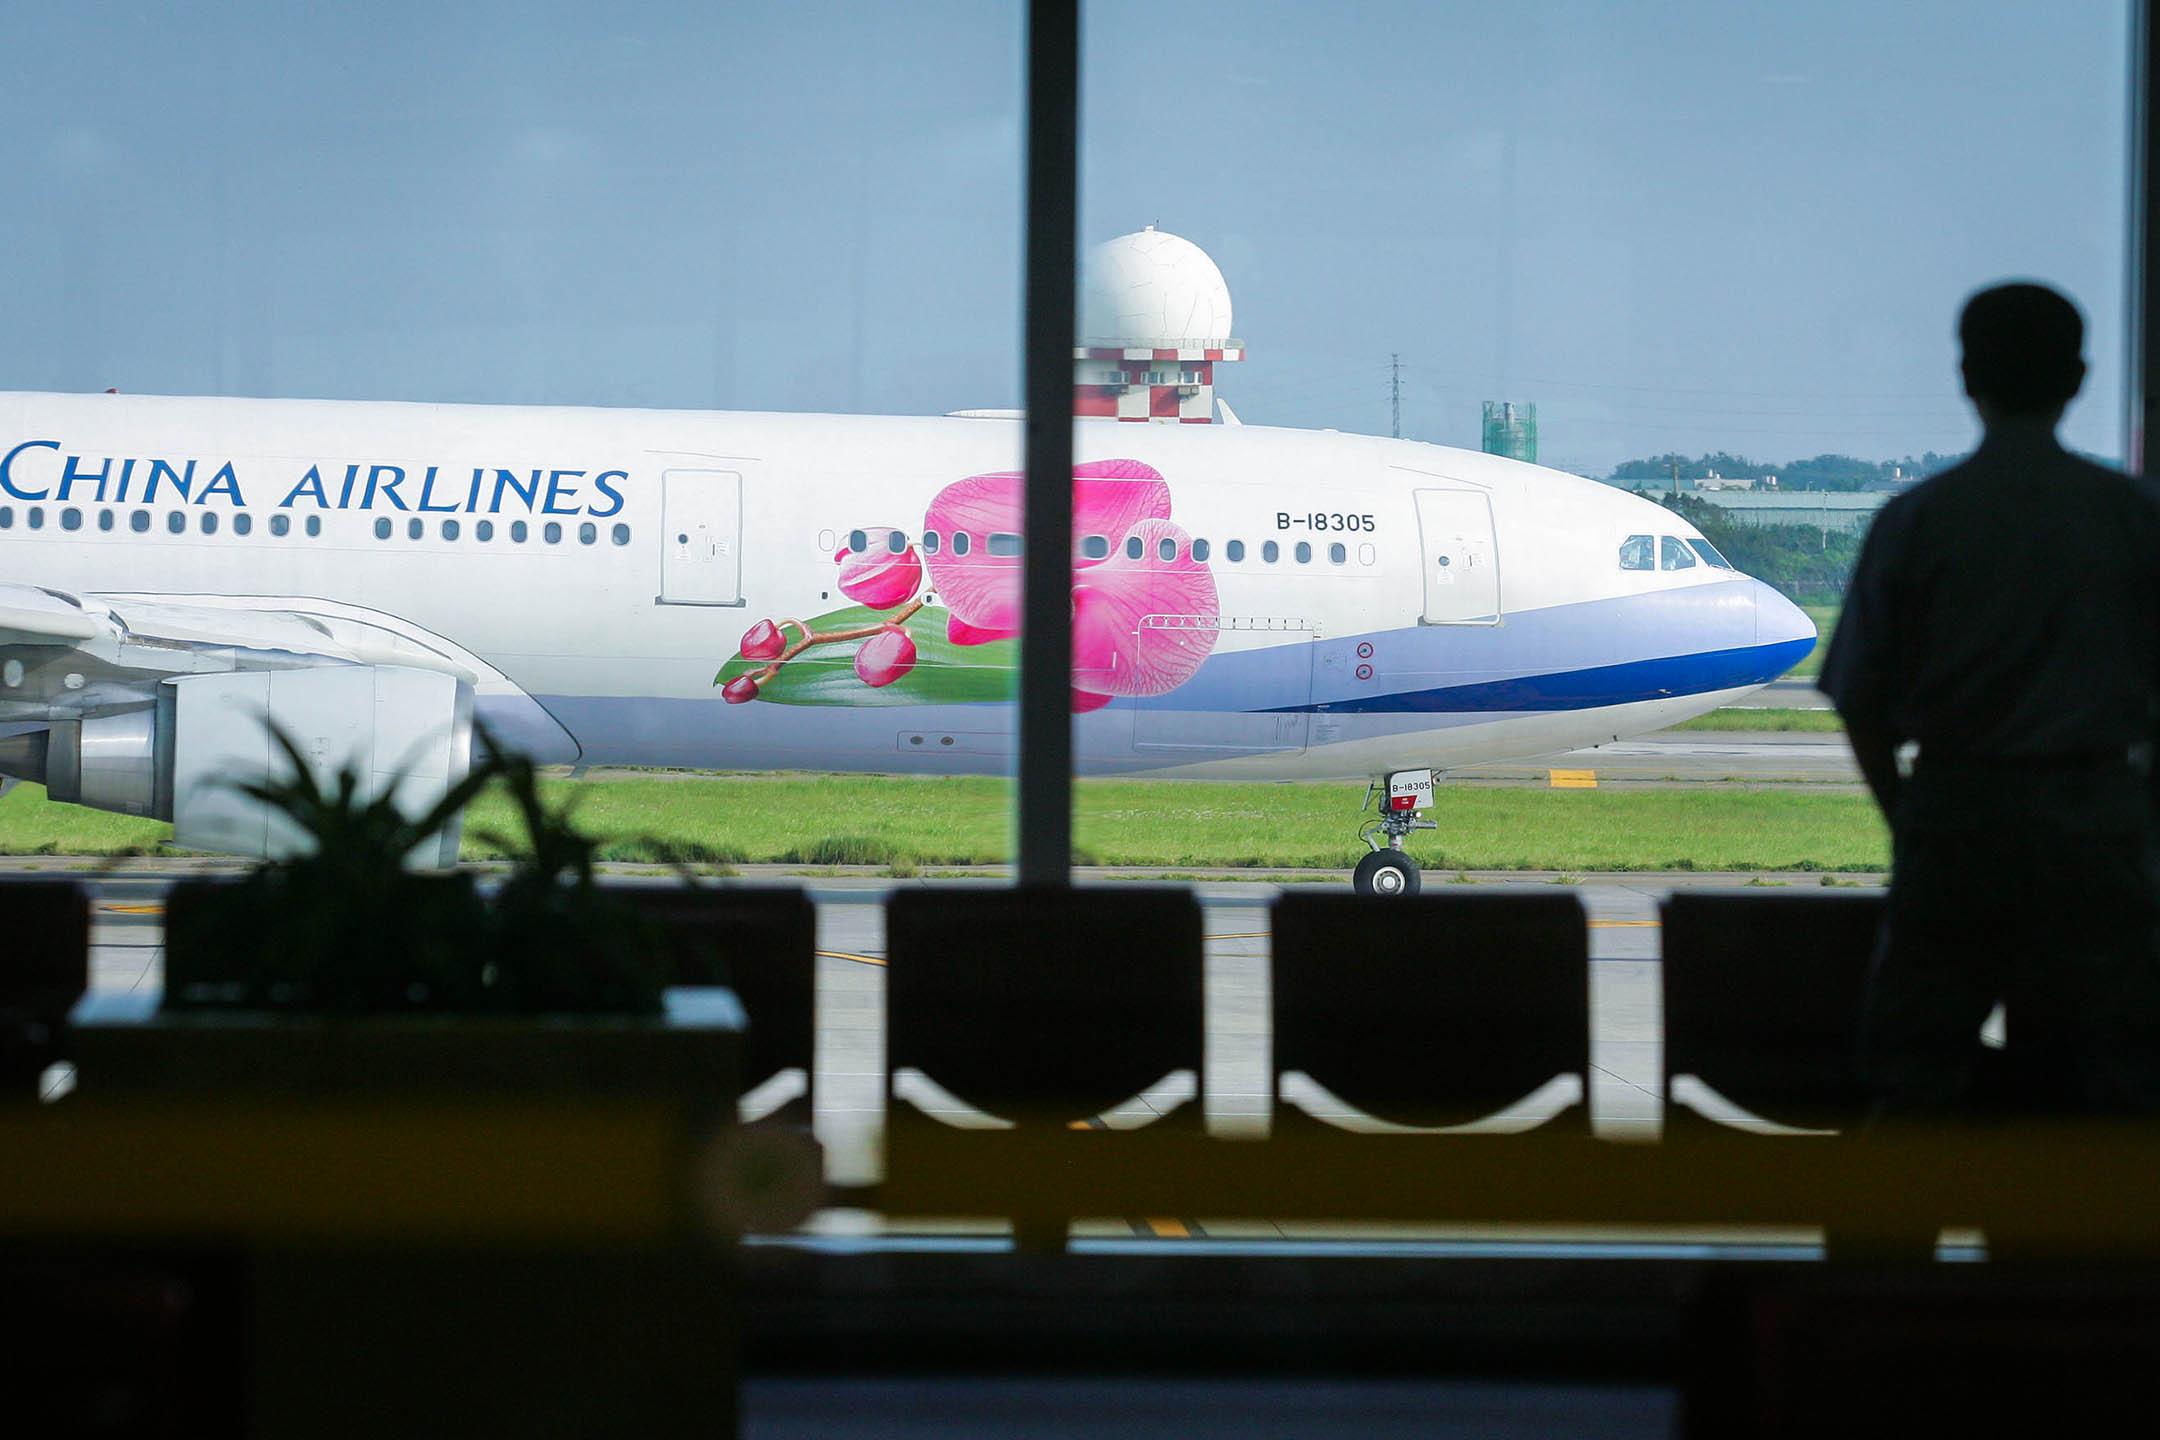 桃園國際機場的中華航空飛機。 攝:Maurice Tsai/Bloomberg via Getty Images